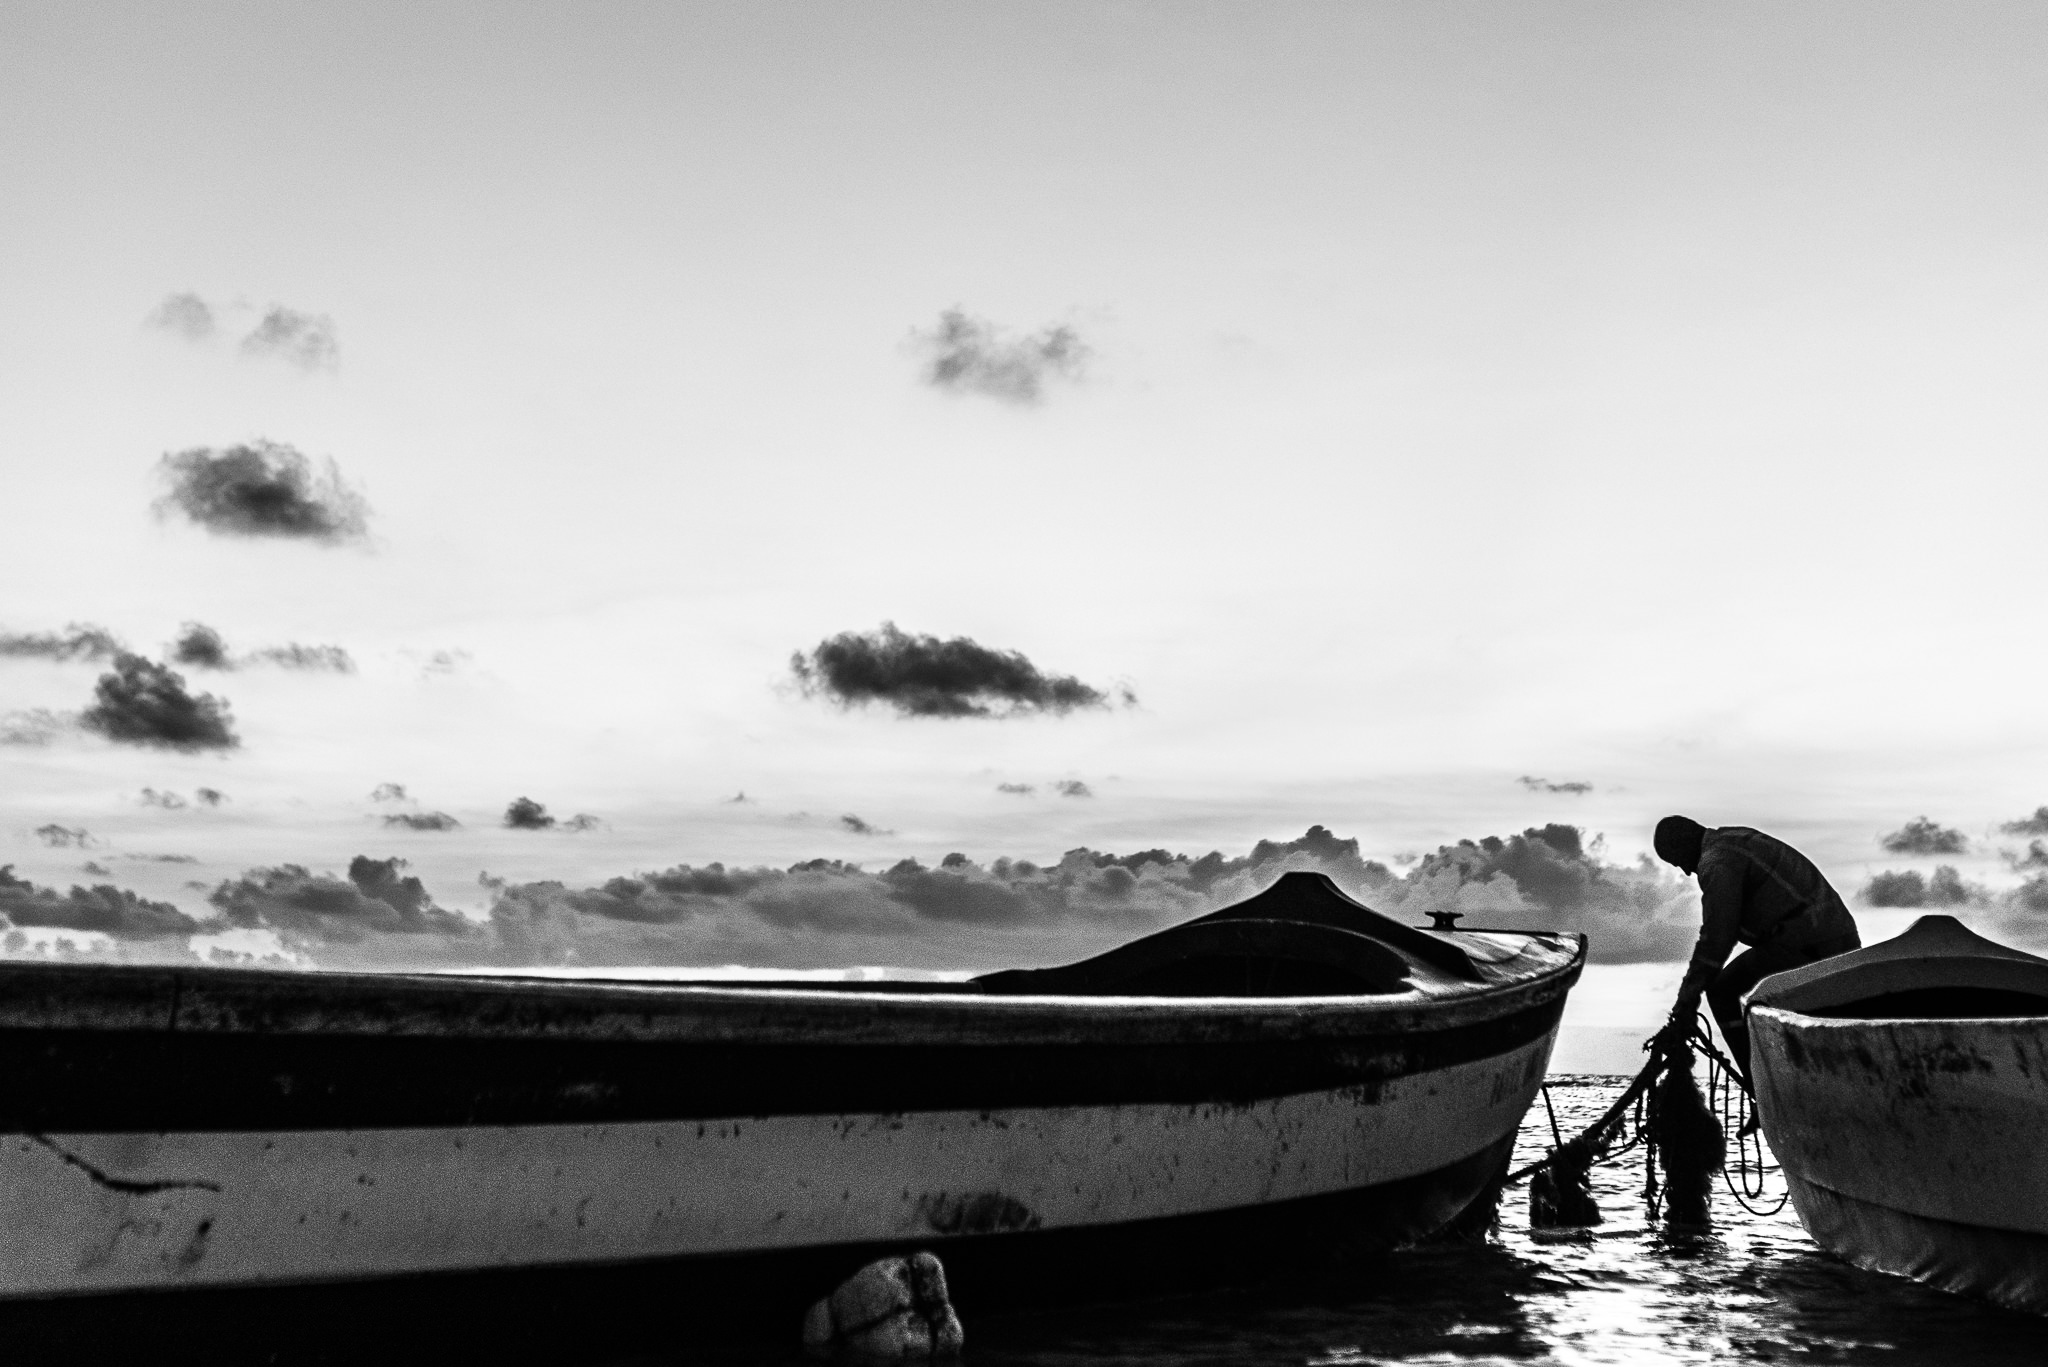 barco_sai_sanandres_colombia_caribe_fisherman_haya_sky_blue_isla_island_00018.jpg